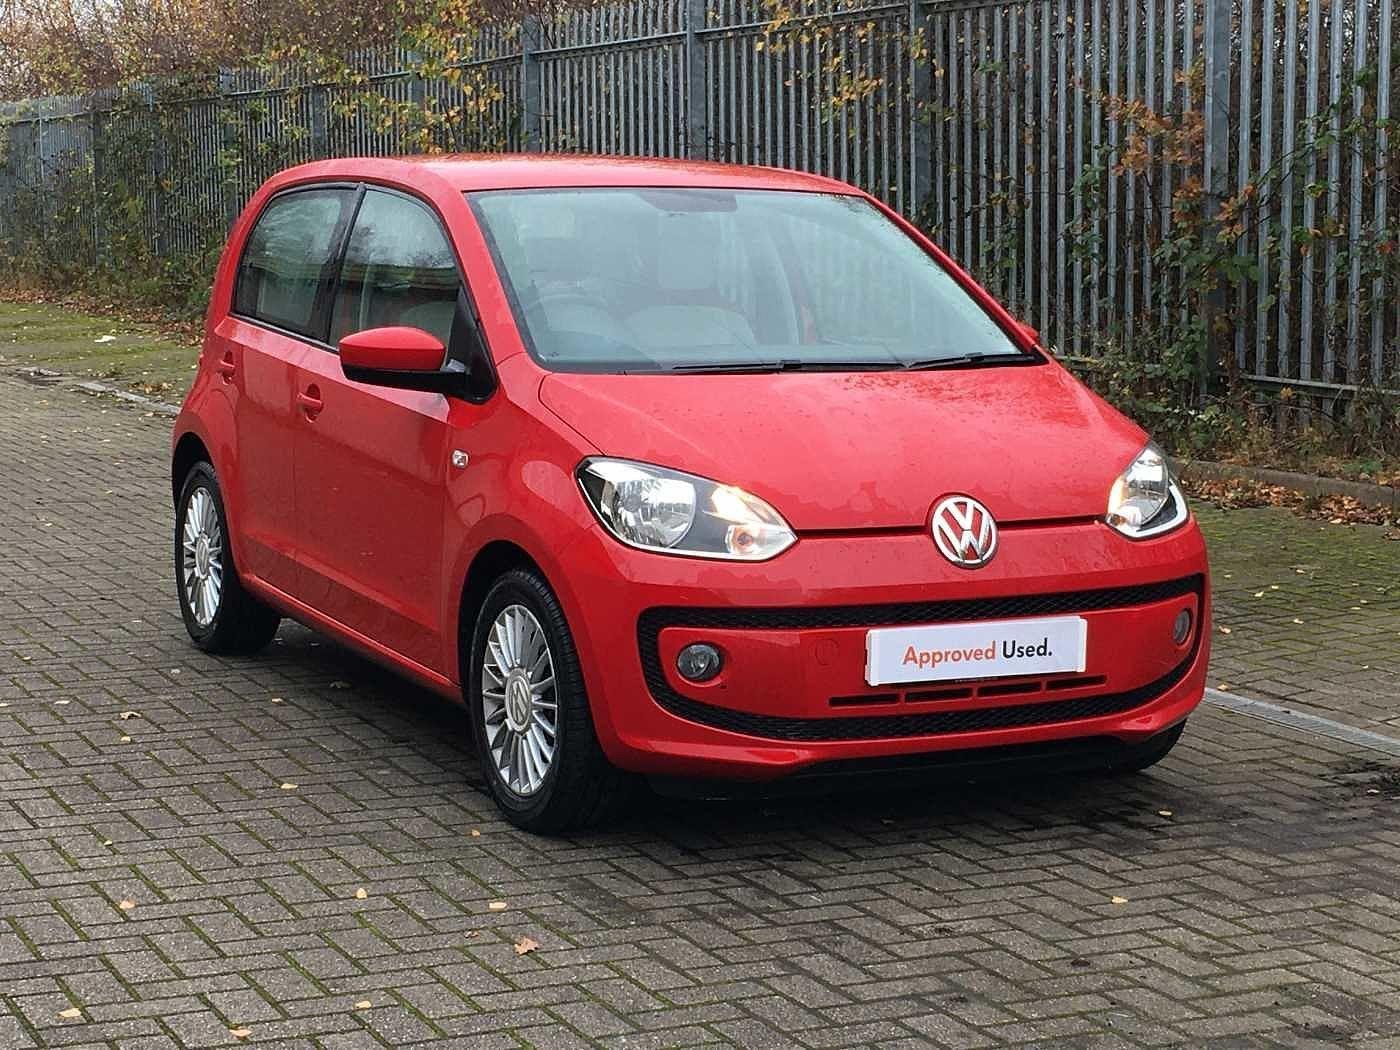 Volkswagen up! 1.0 BlueMotion Tech High up! 5dr